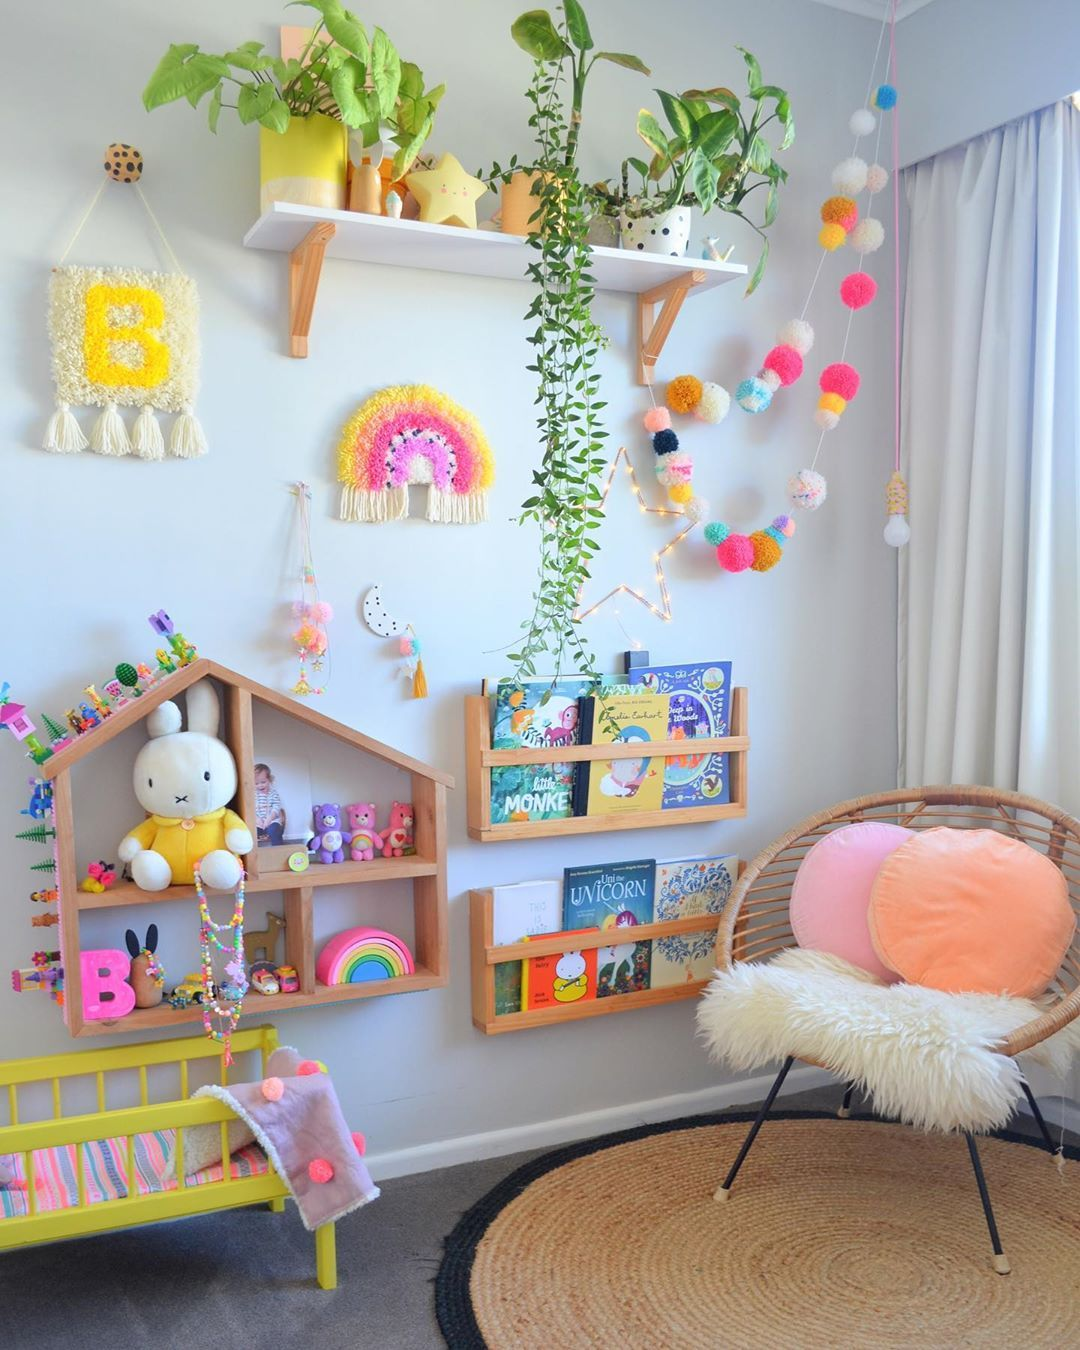 "Kids room & home decor on Instagram: ""Missing Billies old room today! . . . . . #kidsrooms #kidsroomdecor #kidsroominspo #girlsroom #kidsroom #kidsdecor #kidsinterior…"""